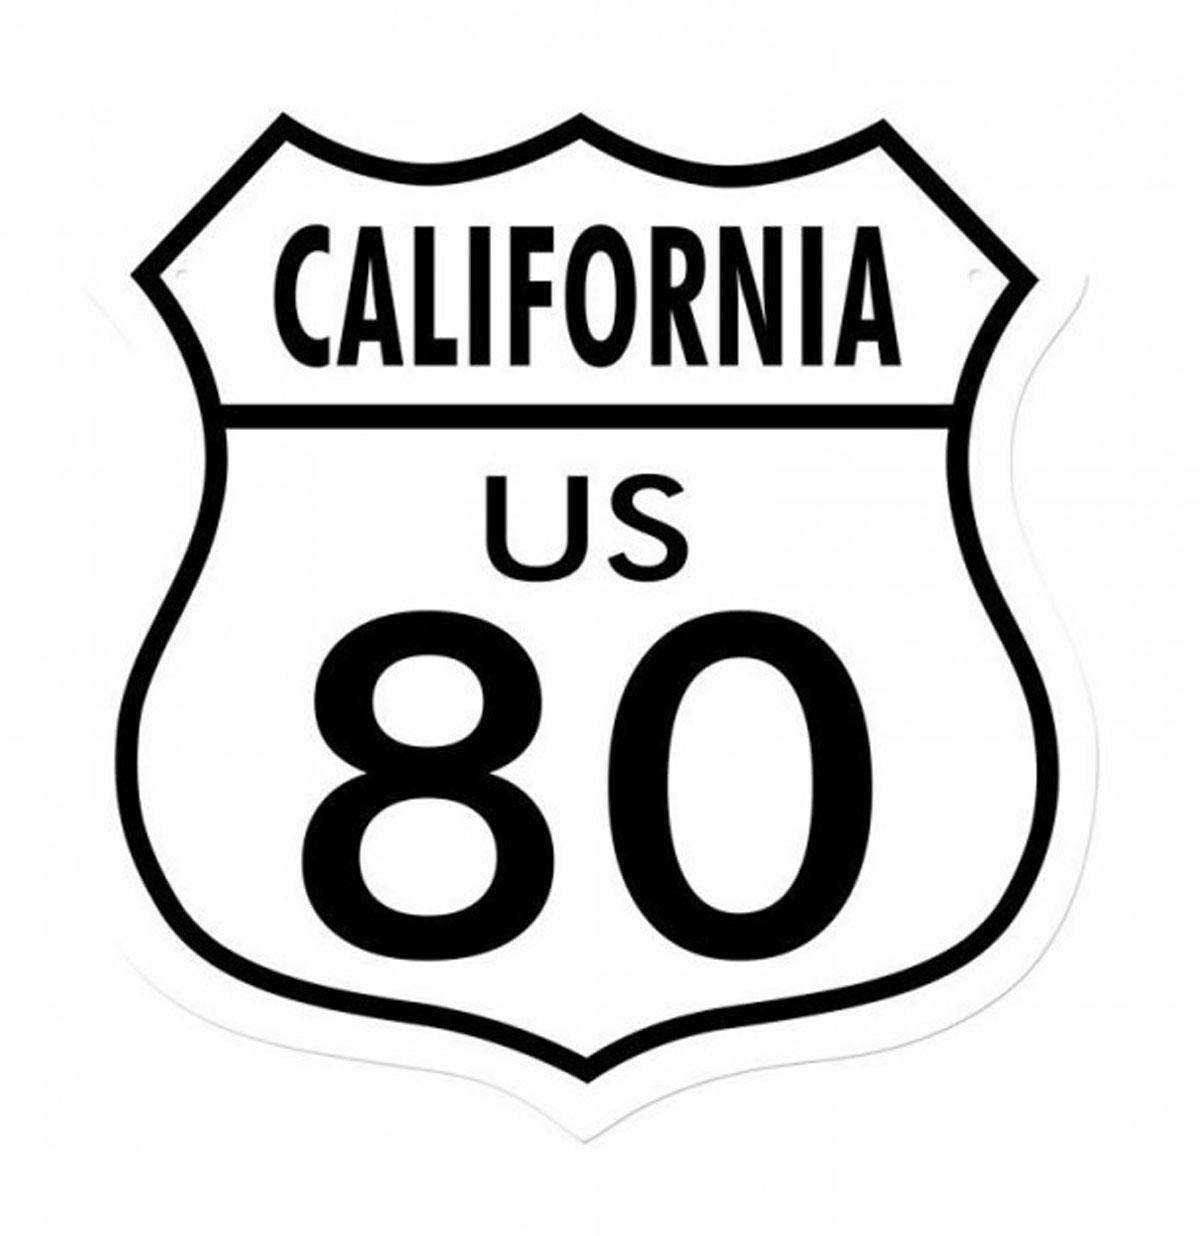 California US 80 Straatbord Zwaar Metalen Bord 38 x 38 cm